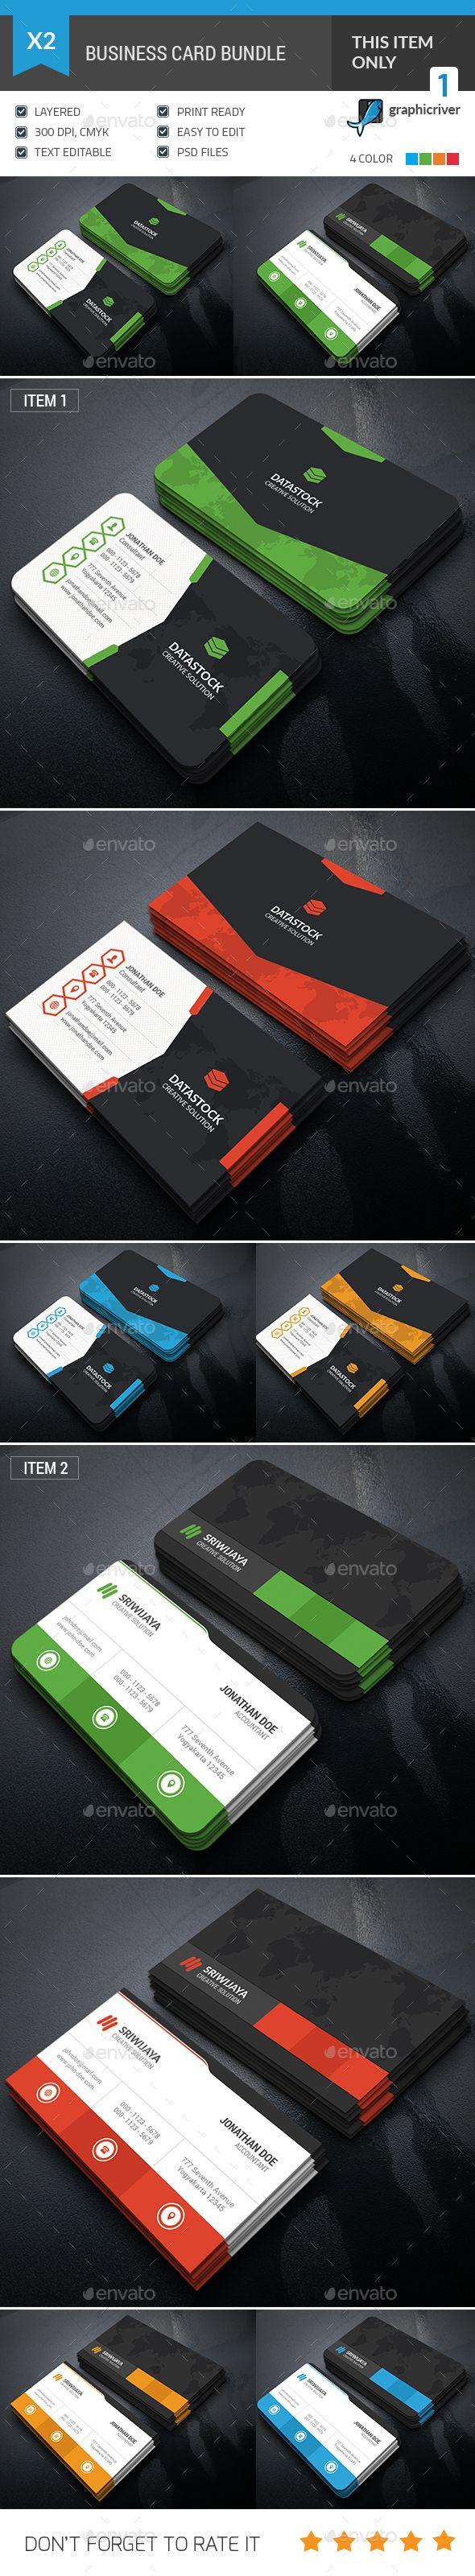 Business Card Template PSD Bundle. Download here: http://graphicriver.net/item/business-card-bundle/15765674?ref=ksioks